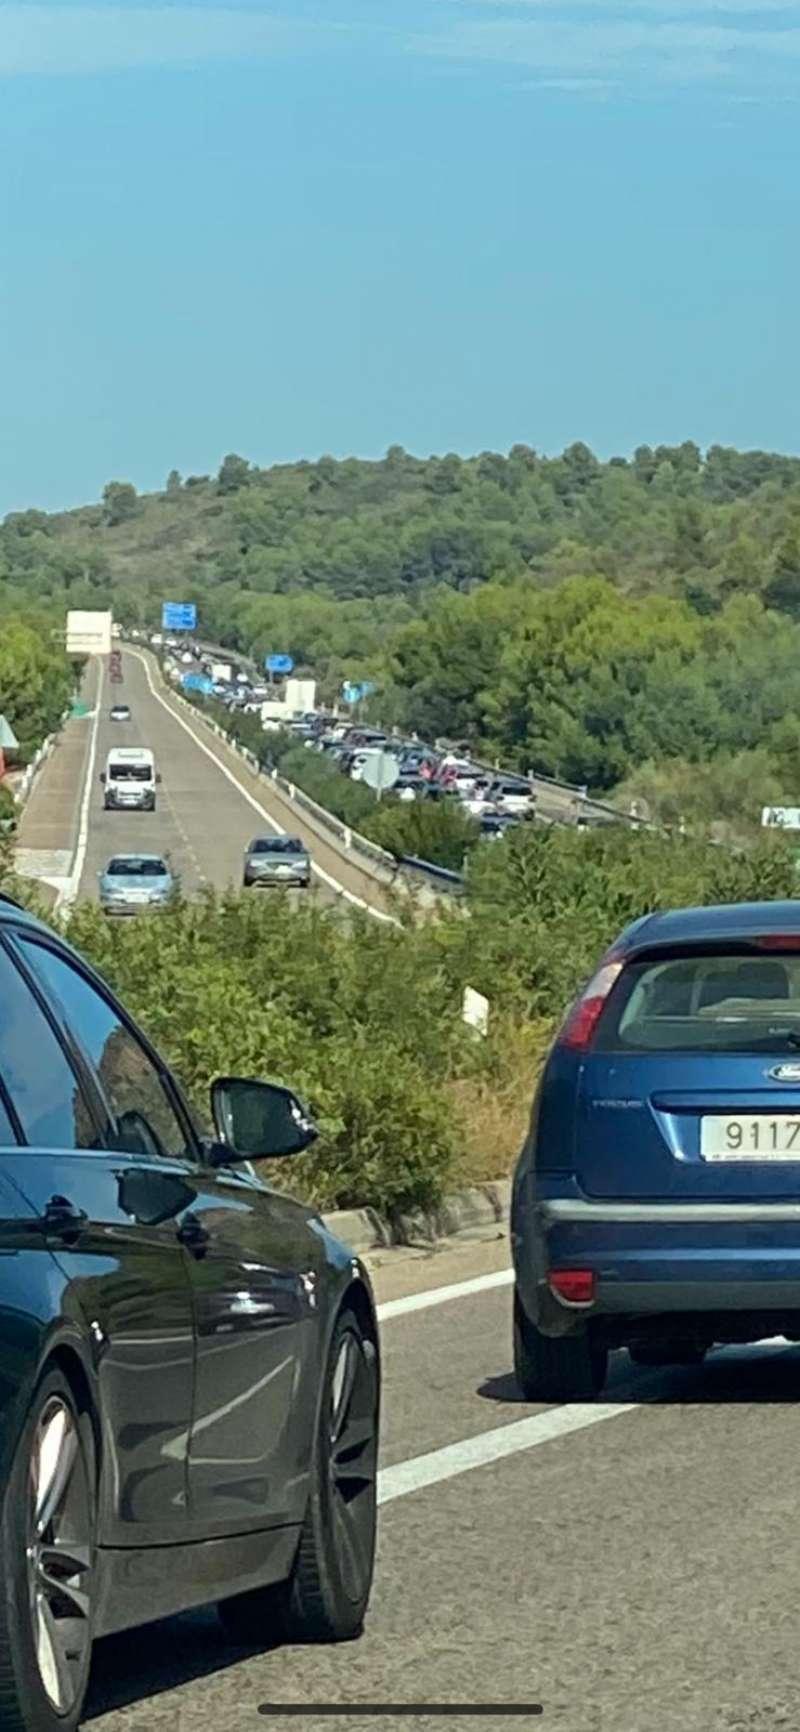 Imagen del atasco en la Autovia A23